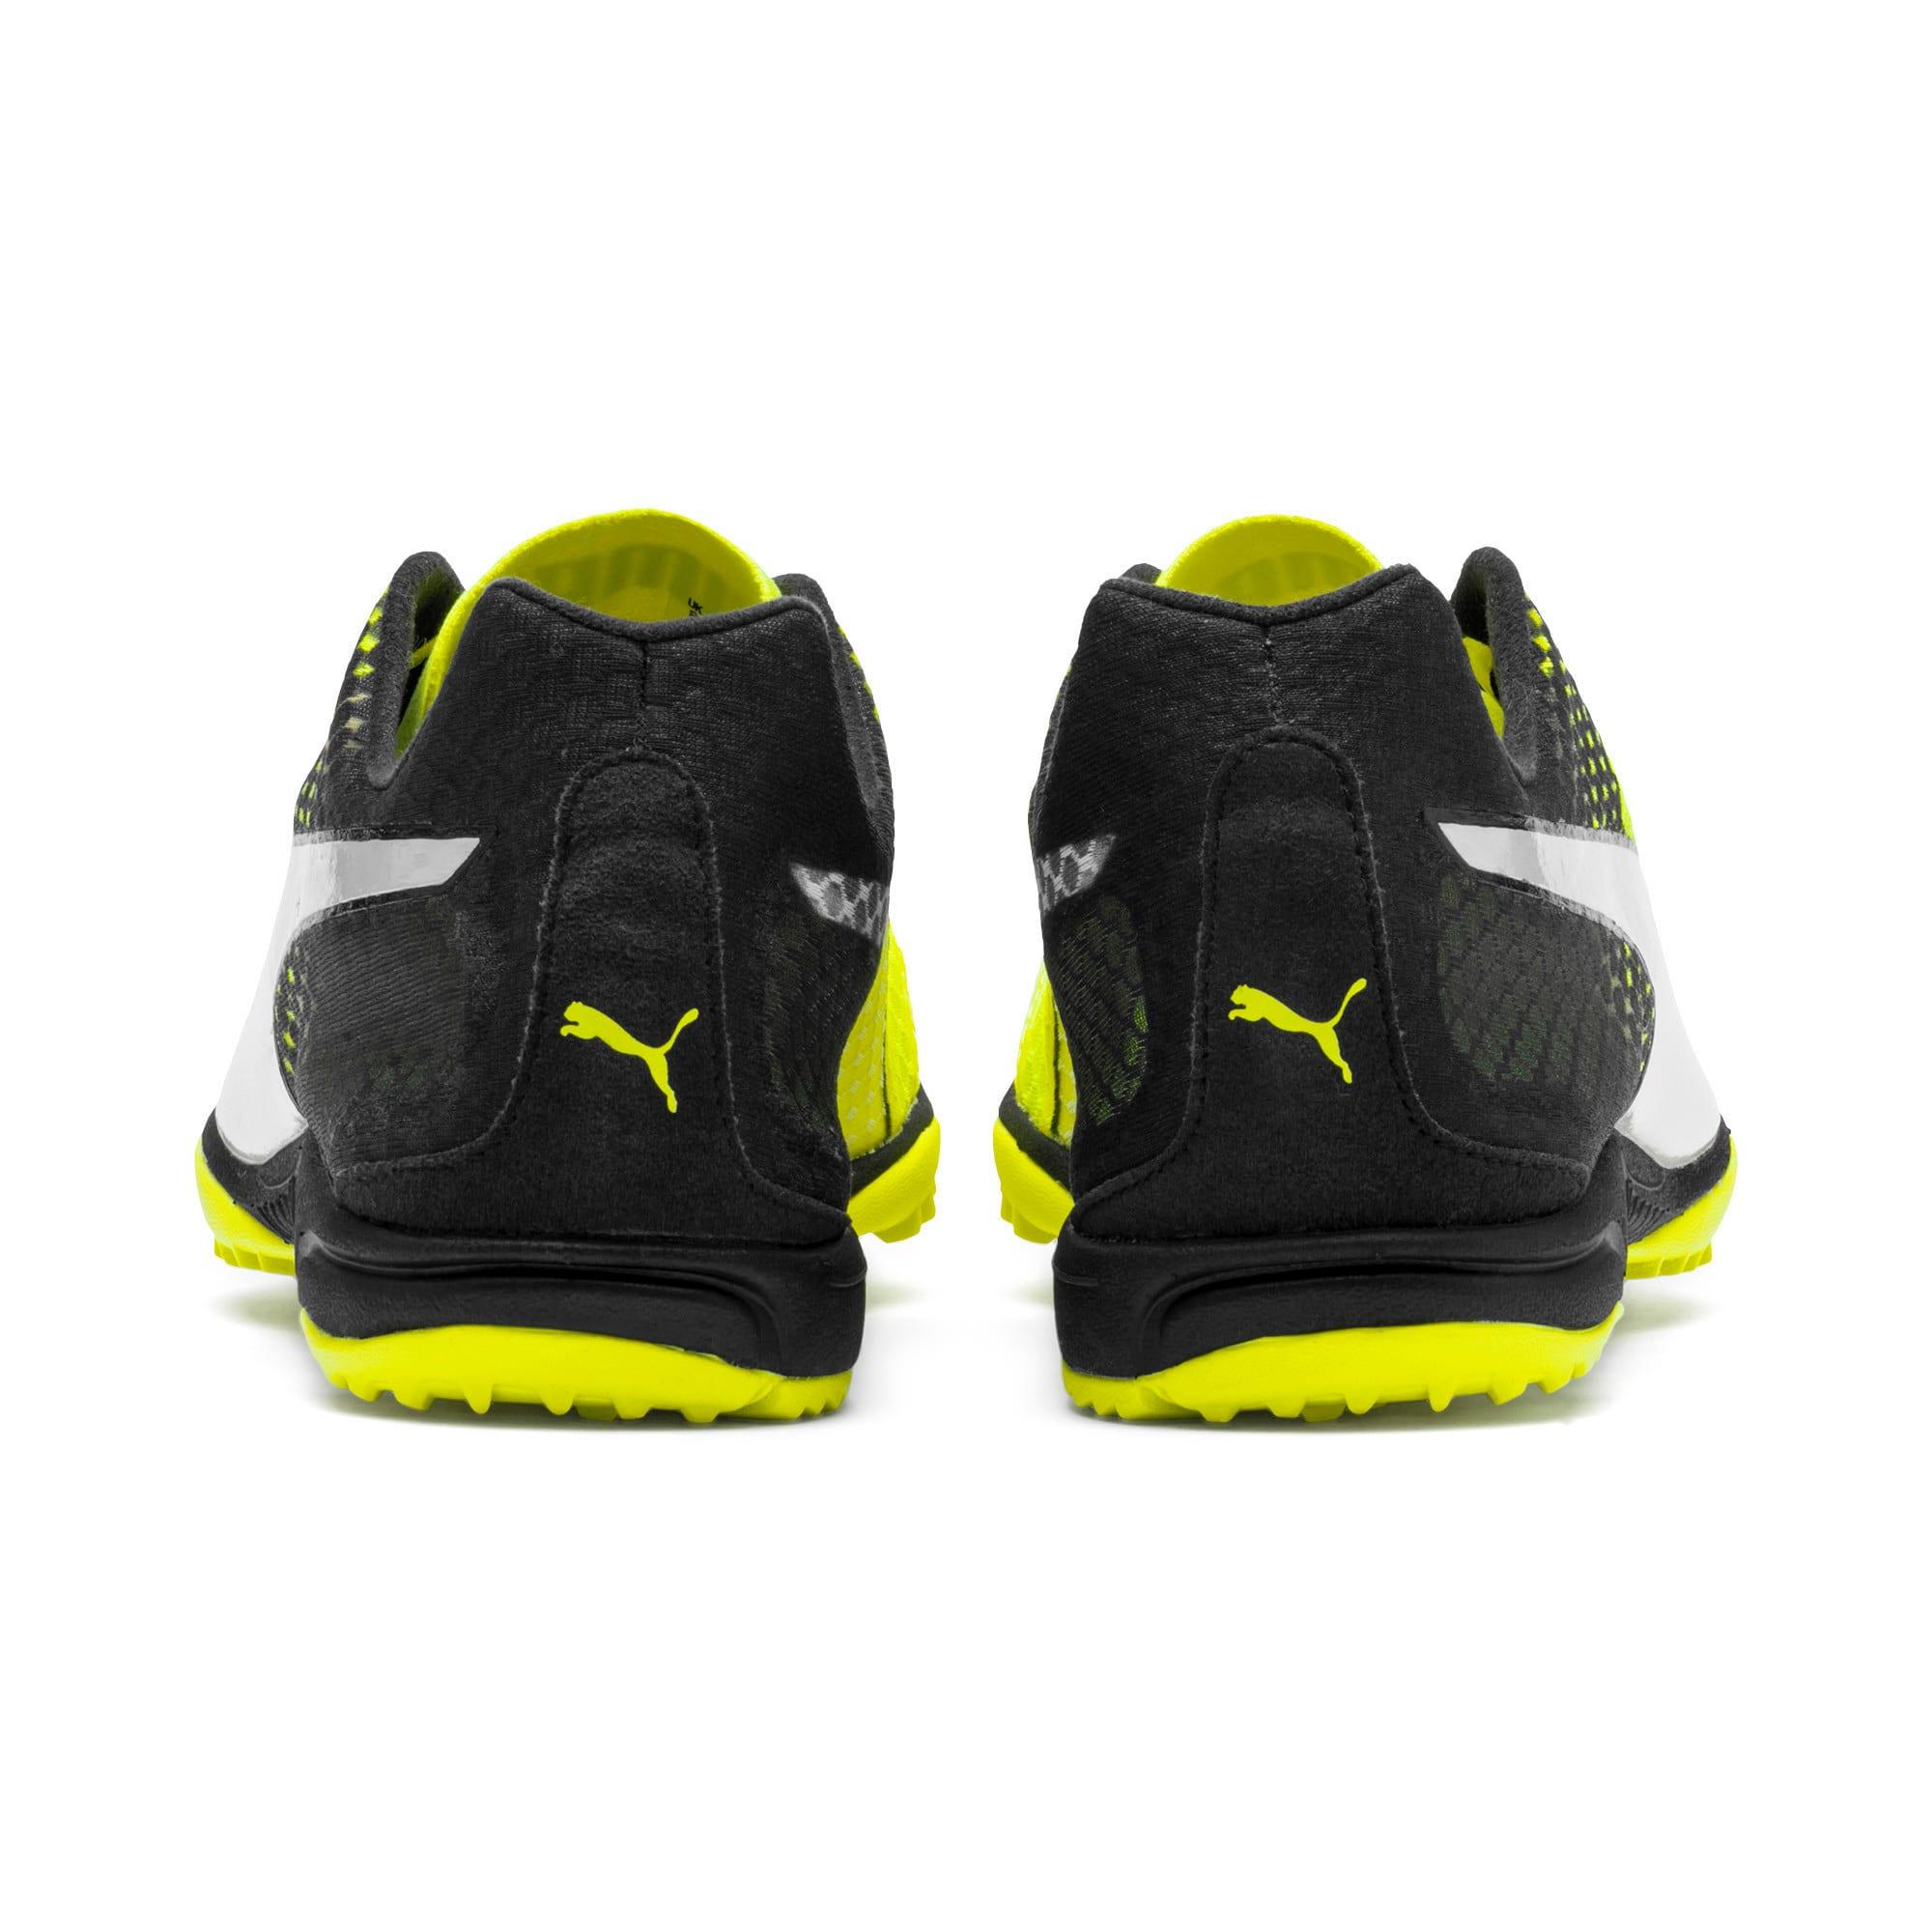 Thumbnail 6 of evoSPEED Haraka 6 Track and Field Boots, Yellow Alert-Black-White, medium-IND